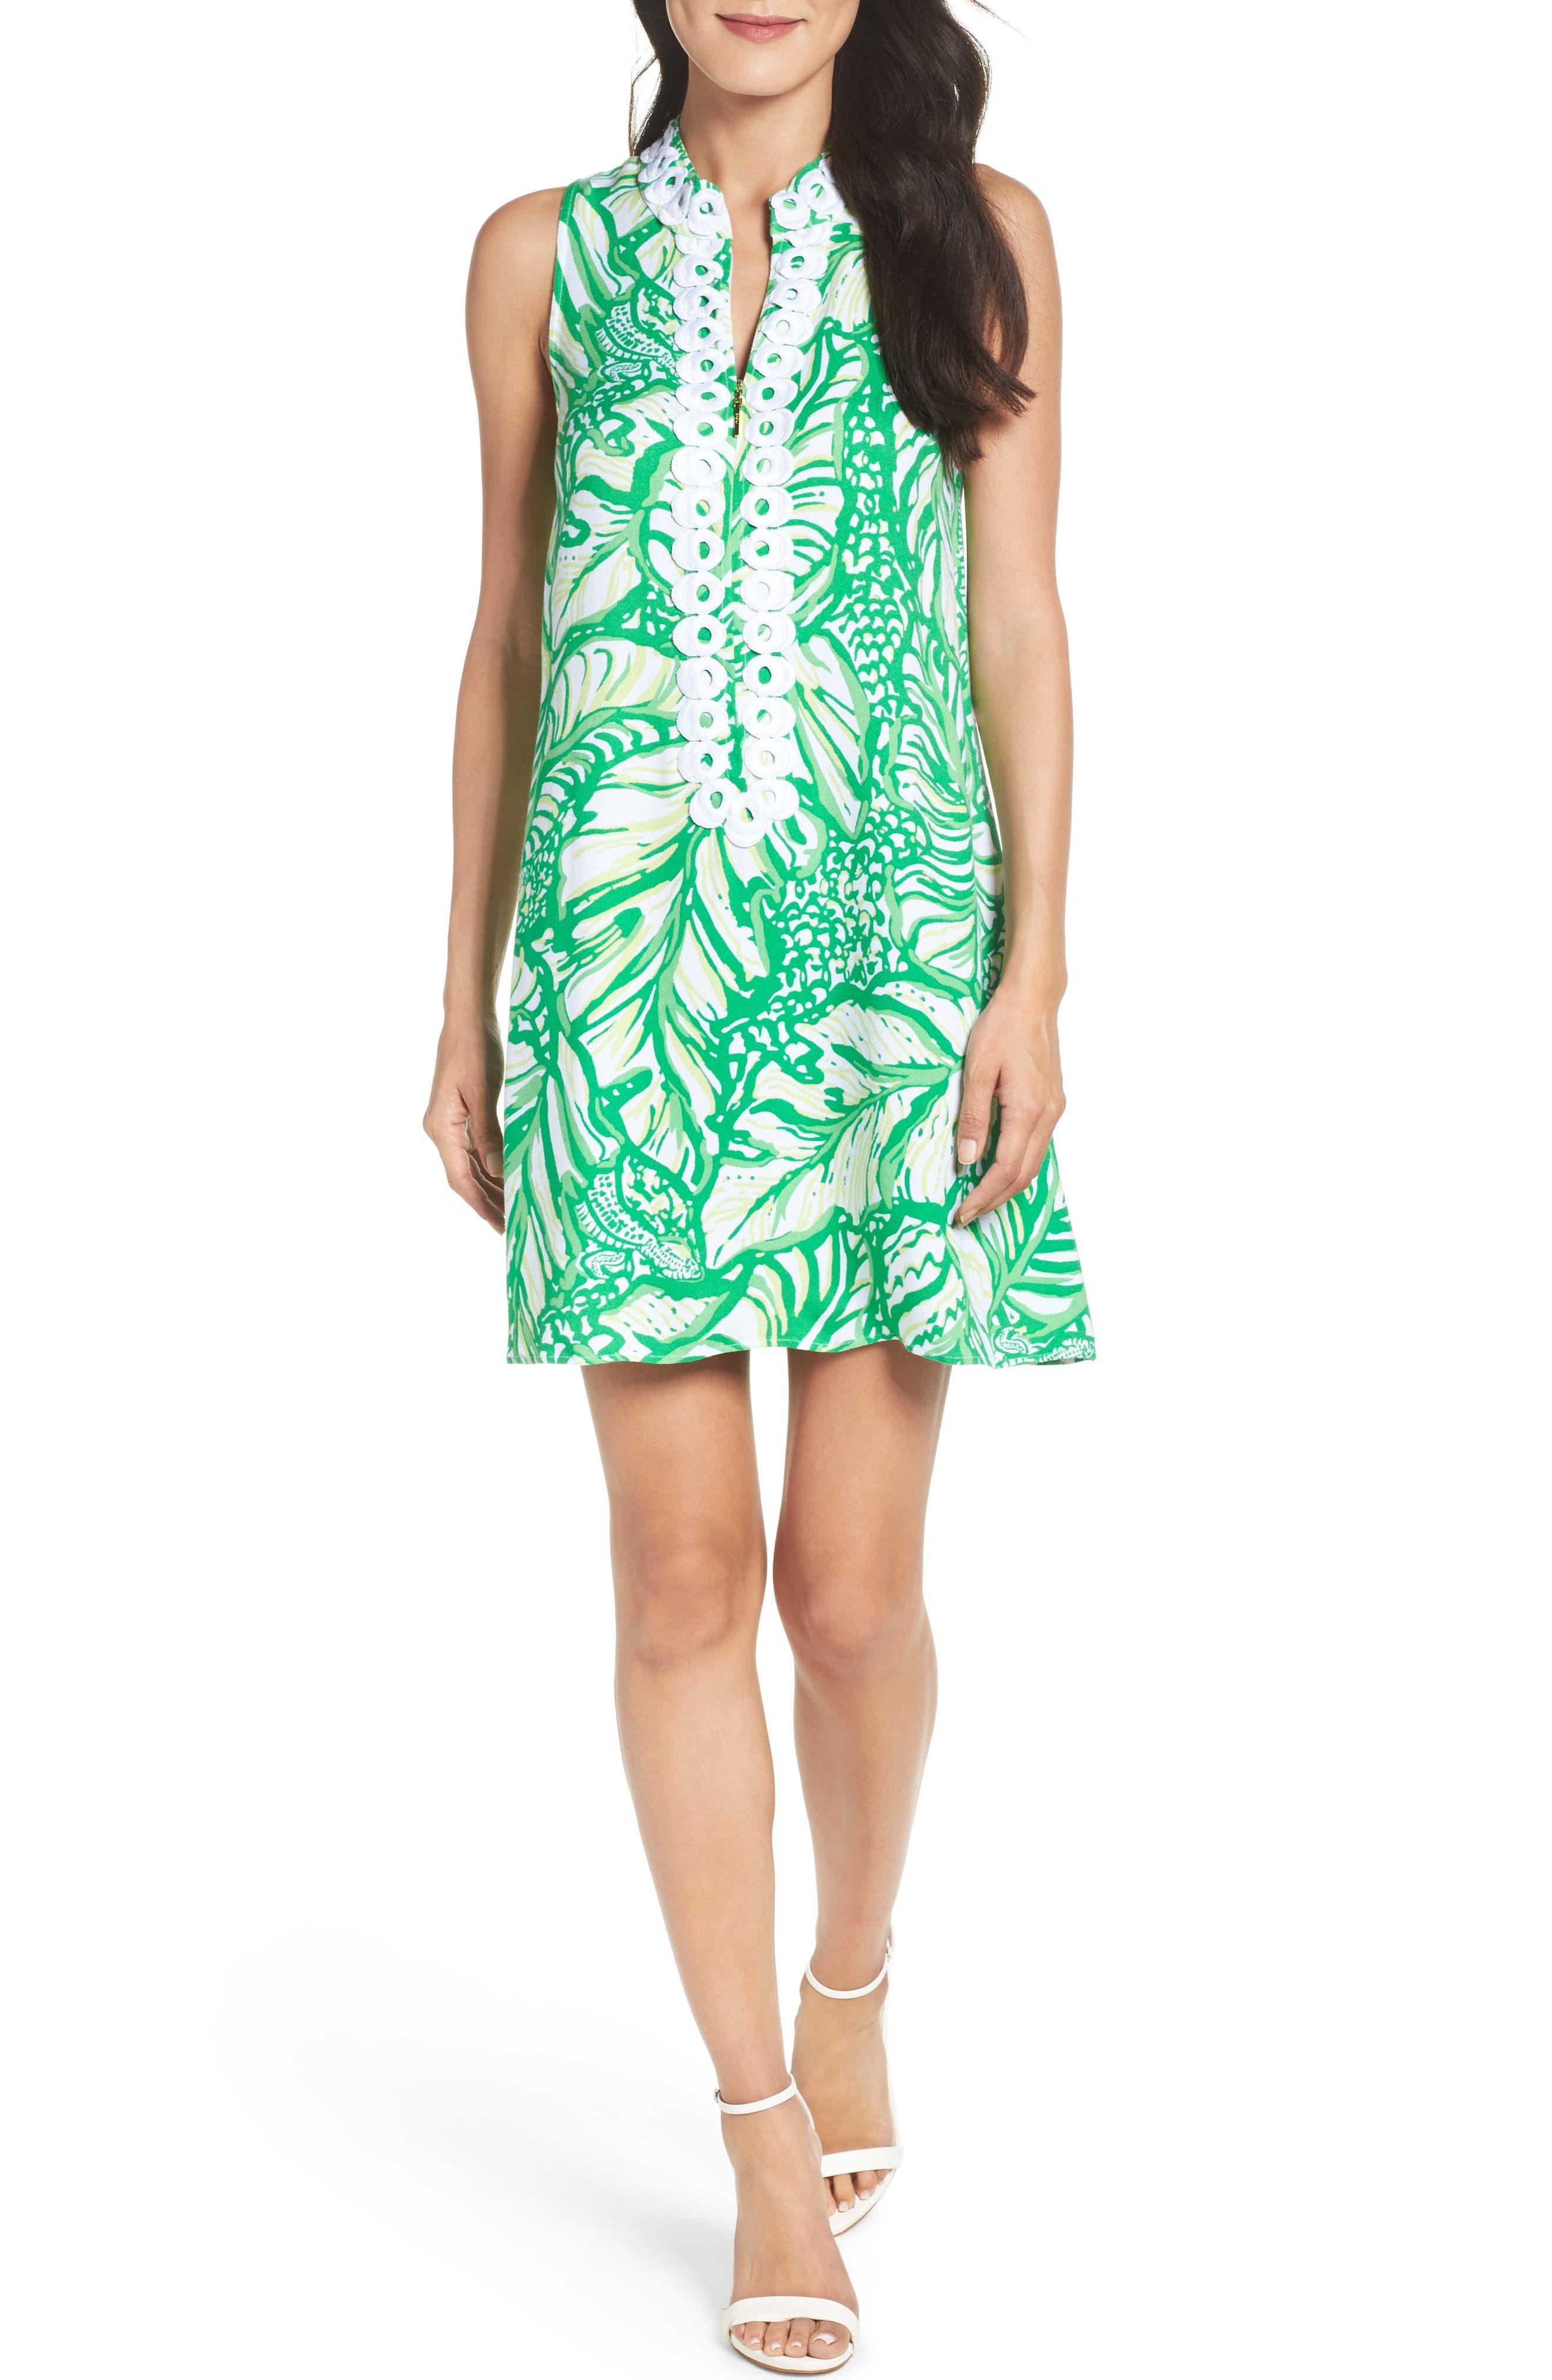 Alternate Image 1 Selected - Lilly Pulitzer® Jane Shift Dress